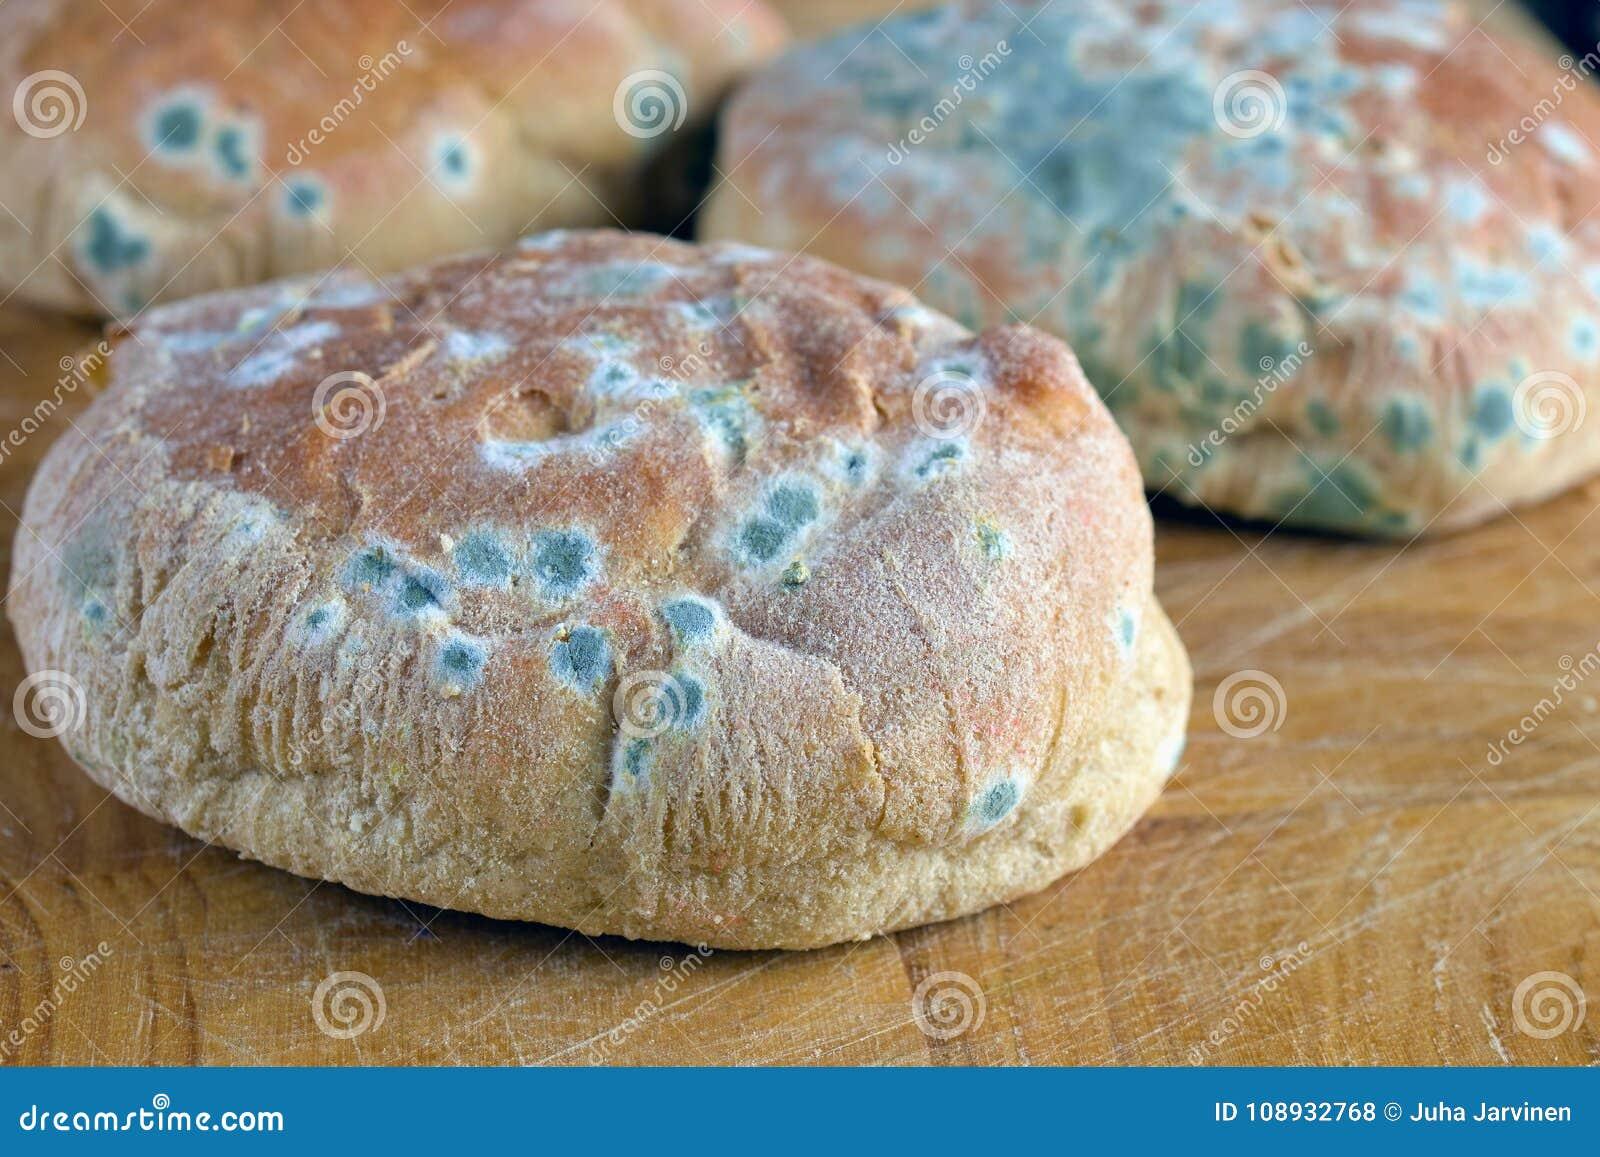 Mold on bread rolls